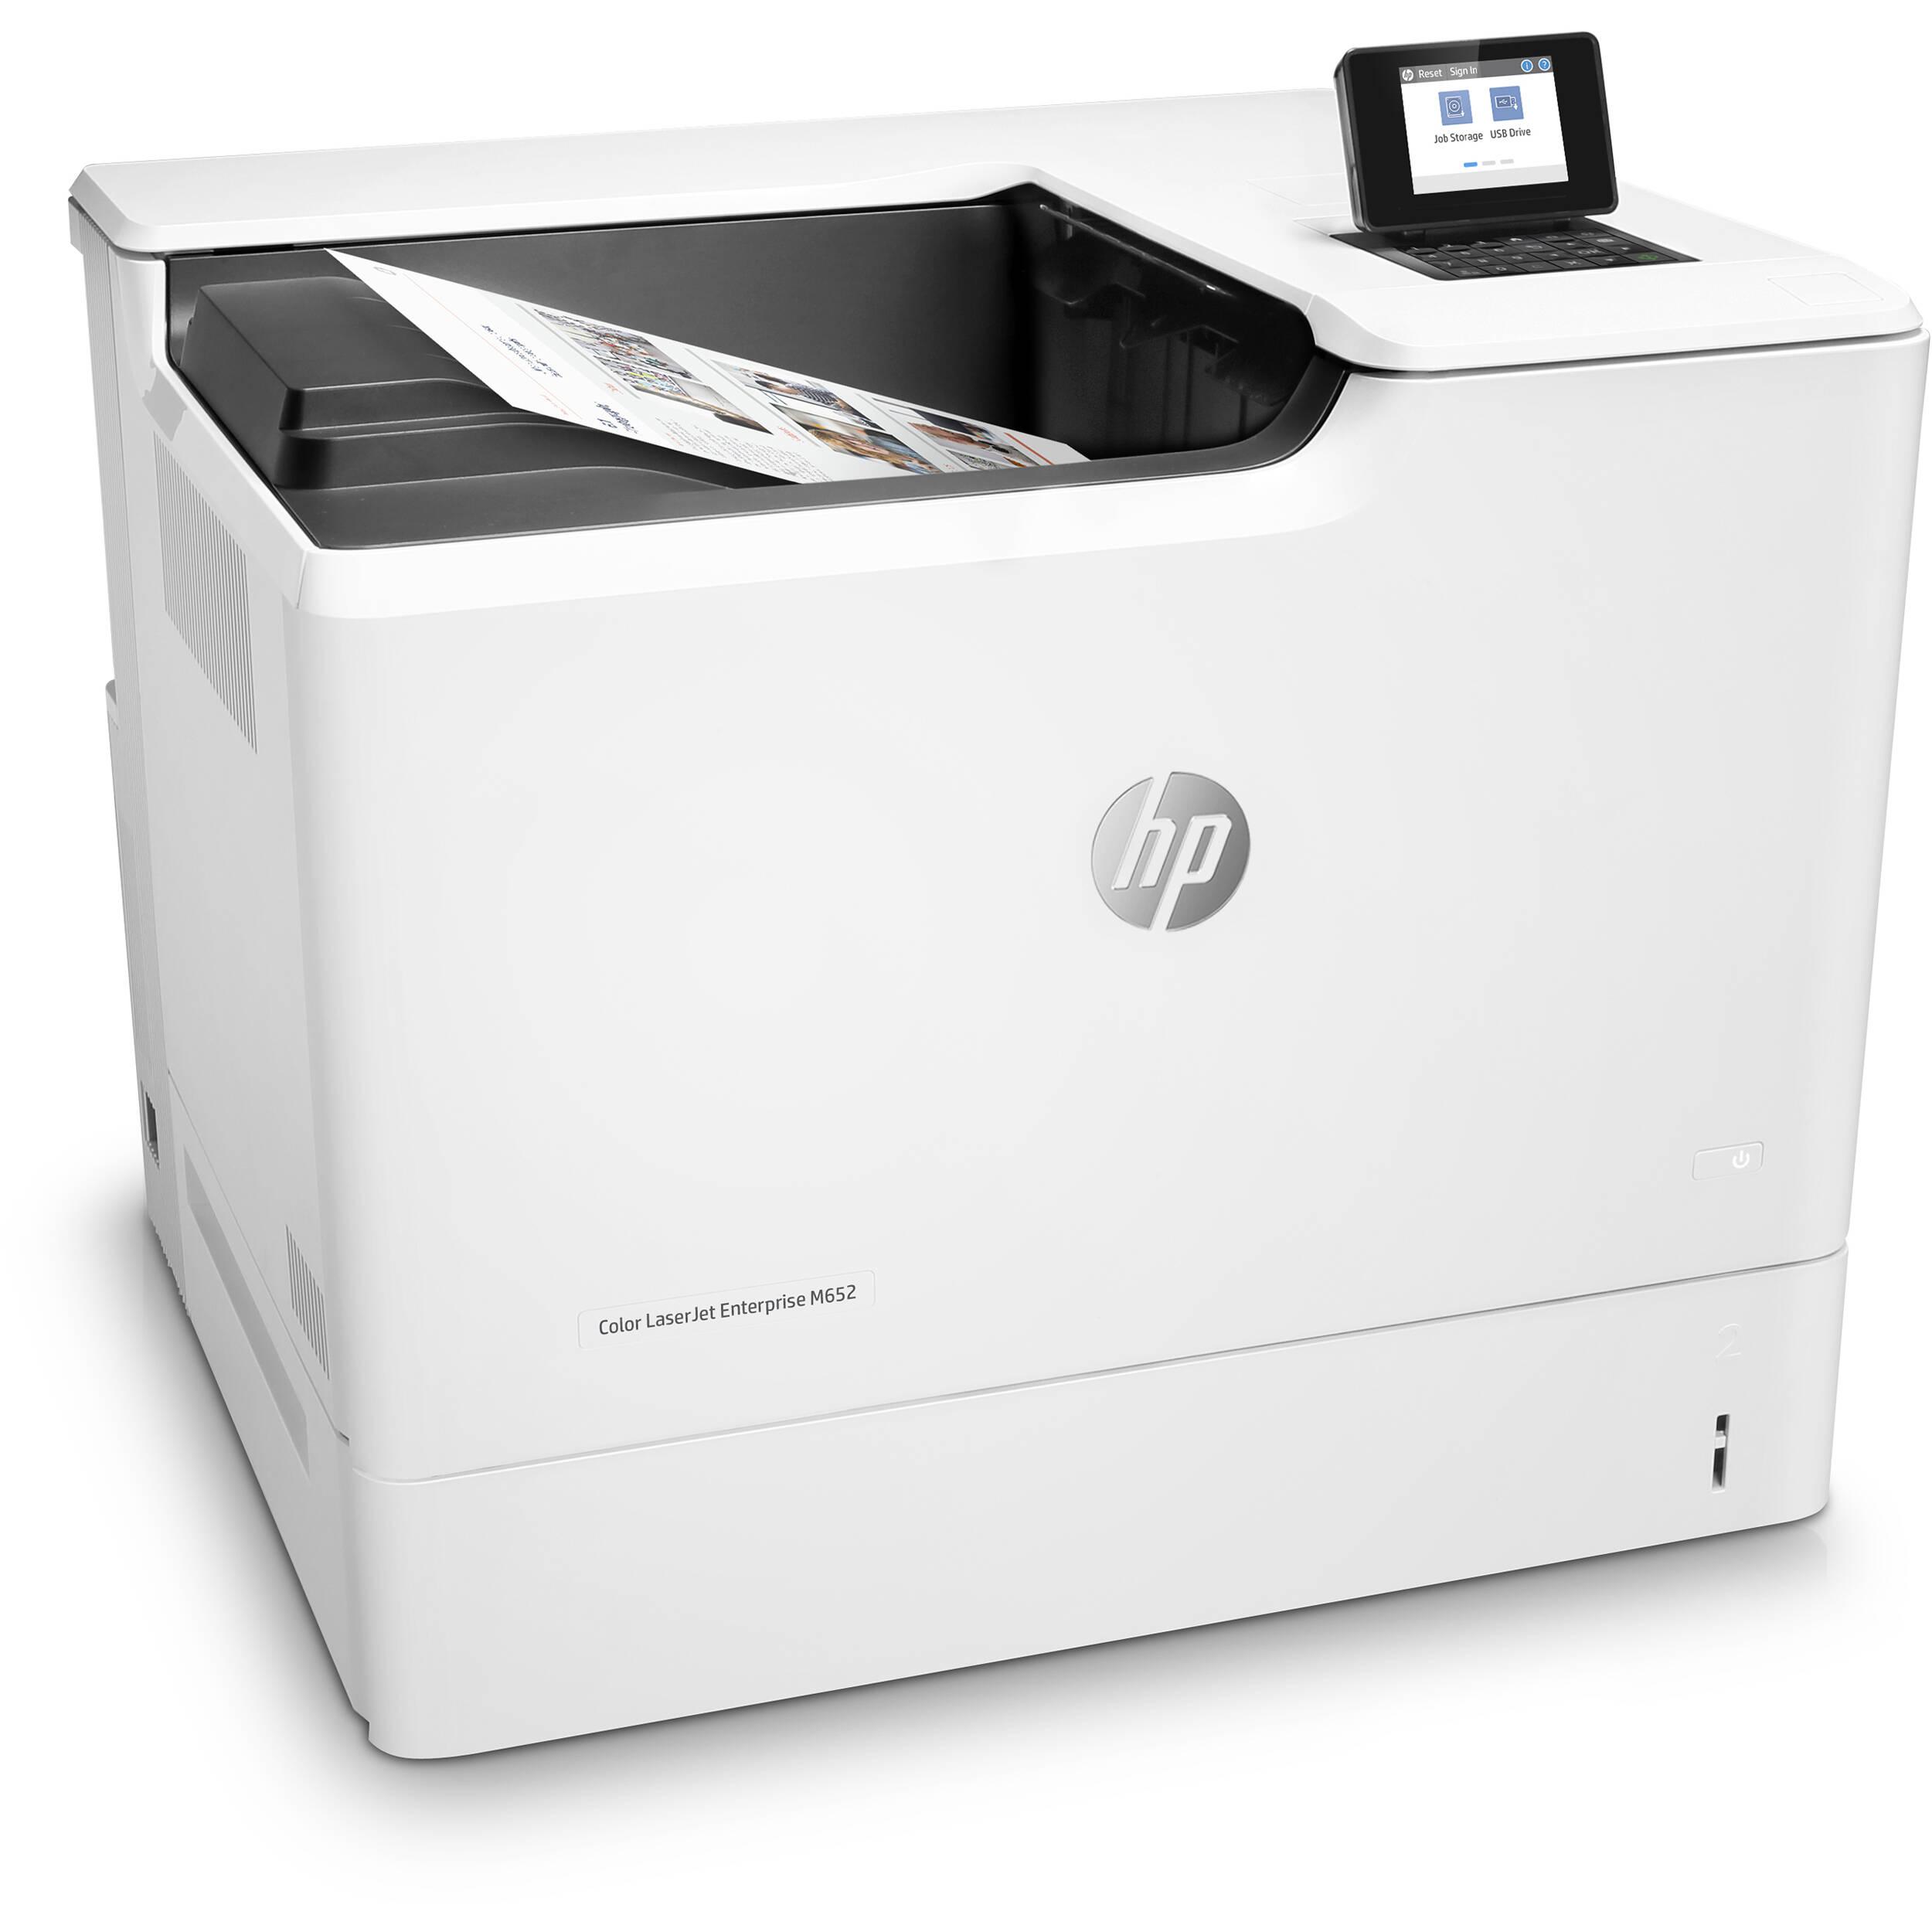 HP POSTSCRIPT LEVEL 3 EMULATION PRINTER TREIBER WINDOWS XP